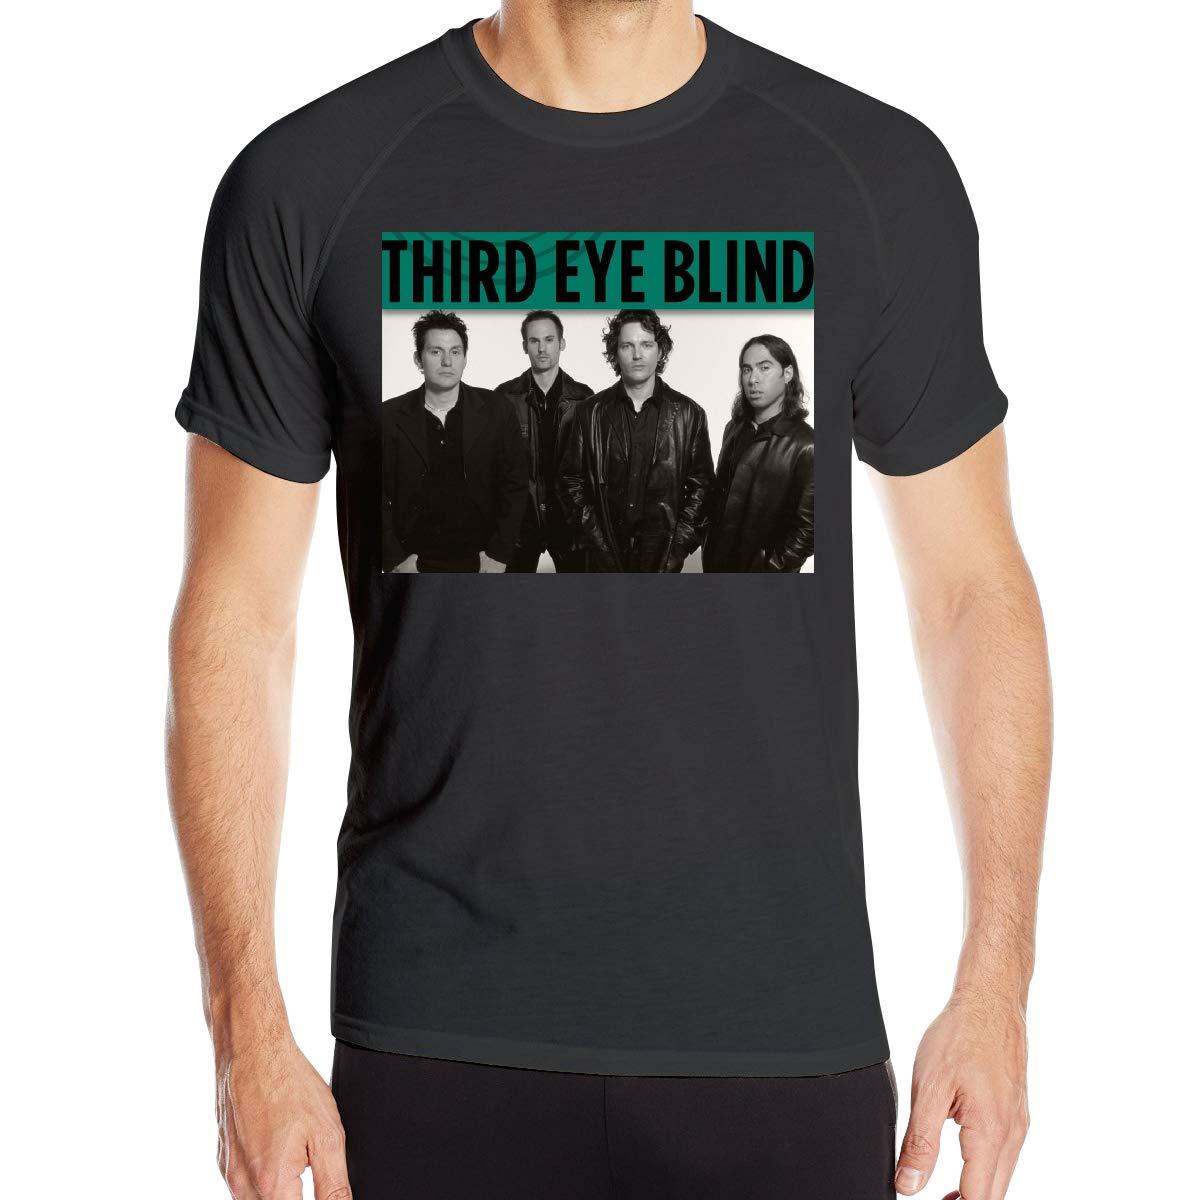 Third Eye Blind Short Sleeve Mans Quick Drying Clothes 1451 Shirts